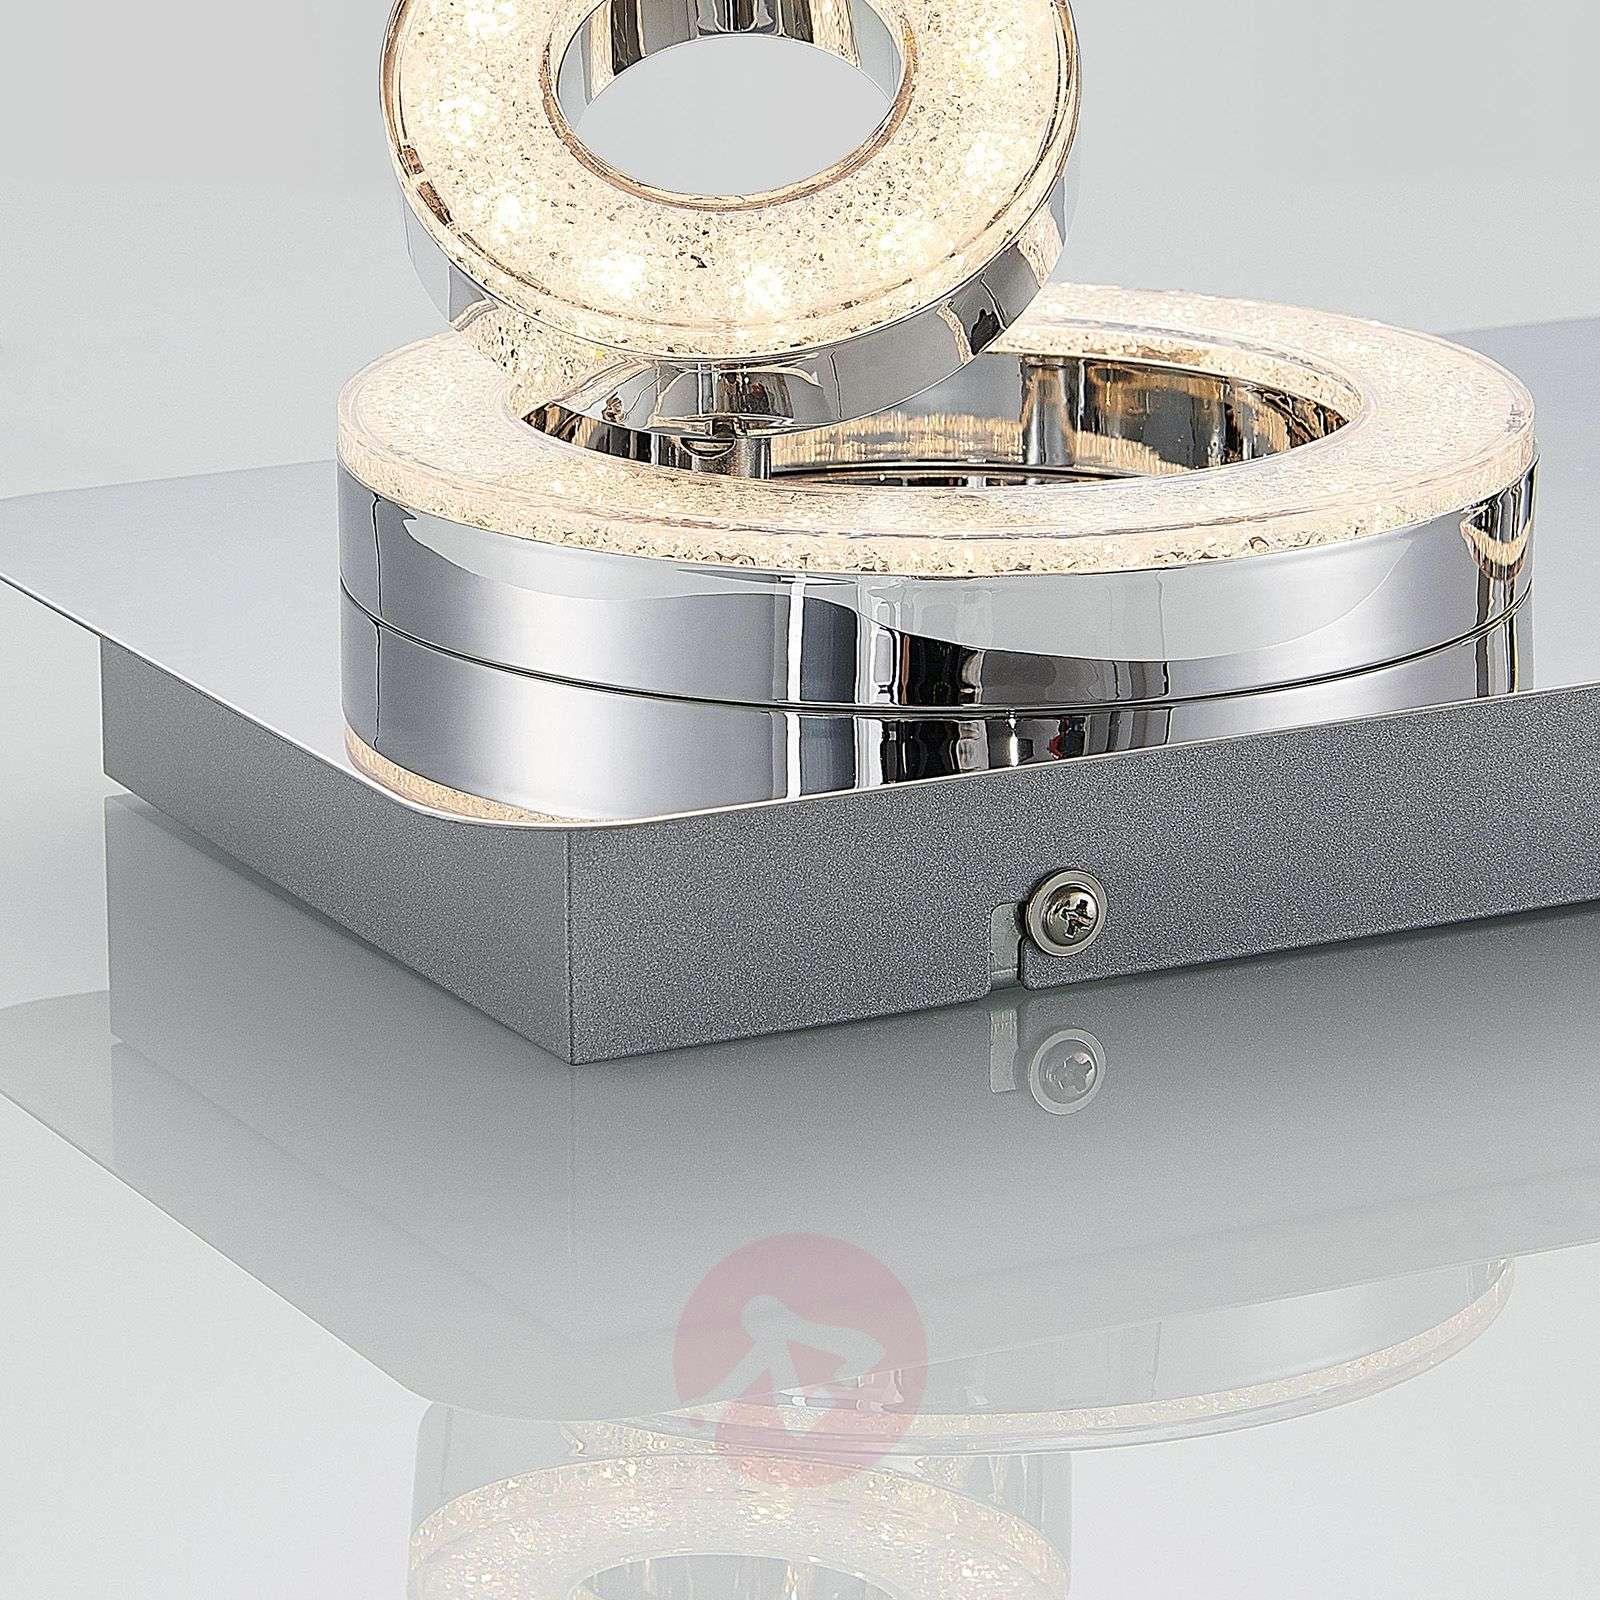 LED-kattovalaisinMikkel, RGBW 40x17cm-7620063-02